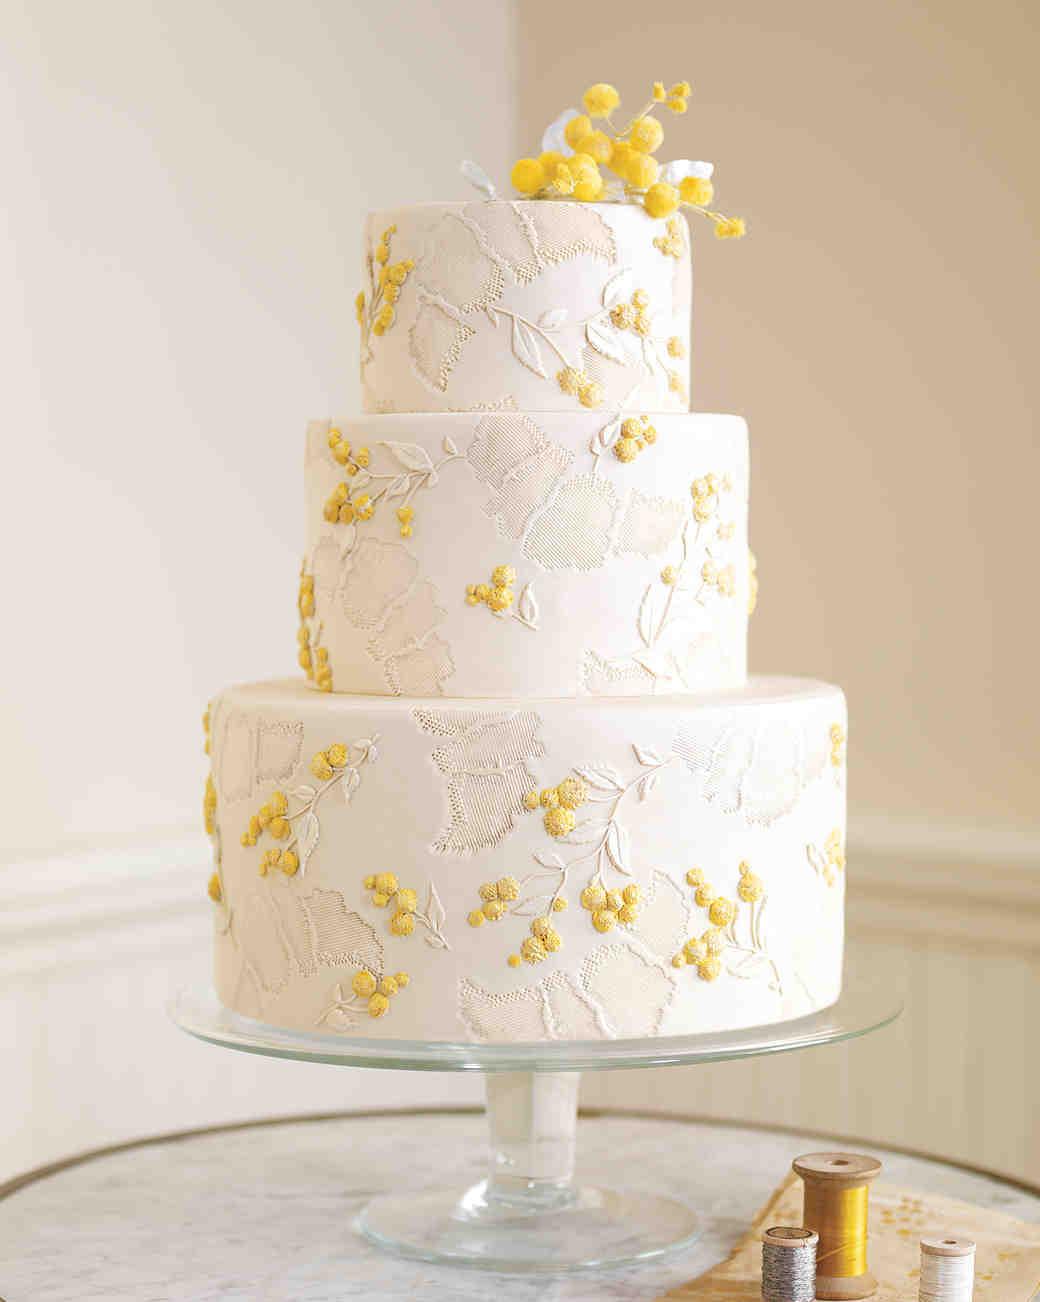 ron-ben-israel-cakes-spring-2010-mwd105426mimosa4b-0814.jpg